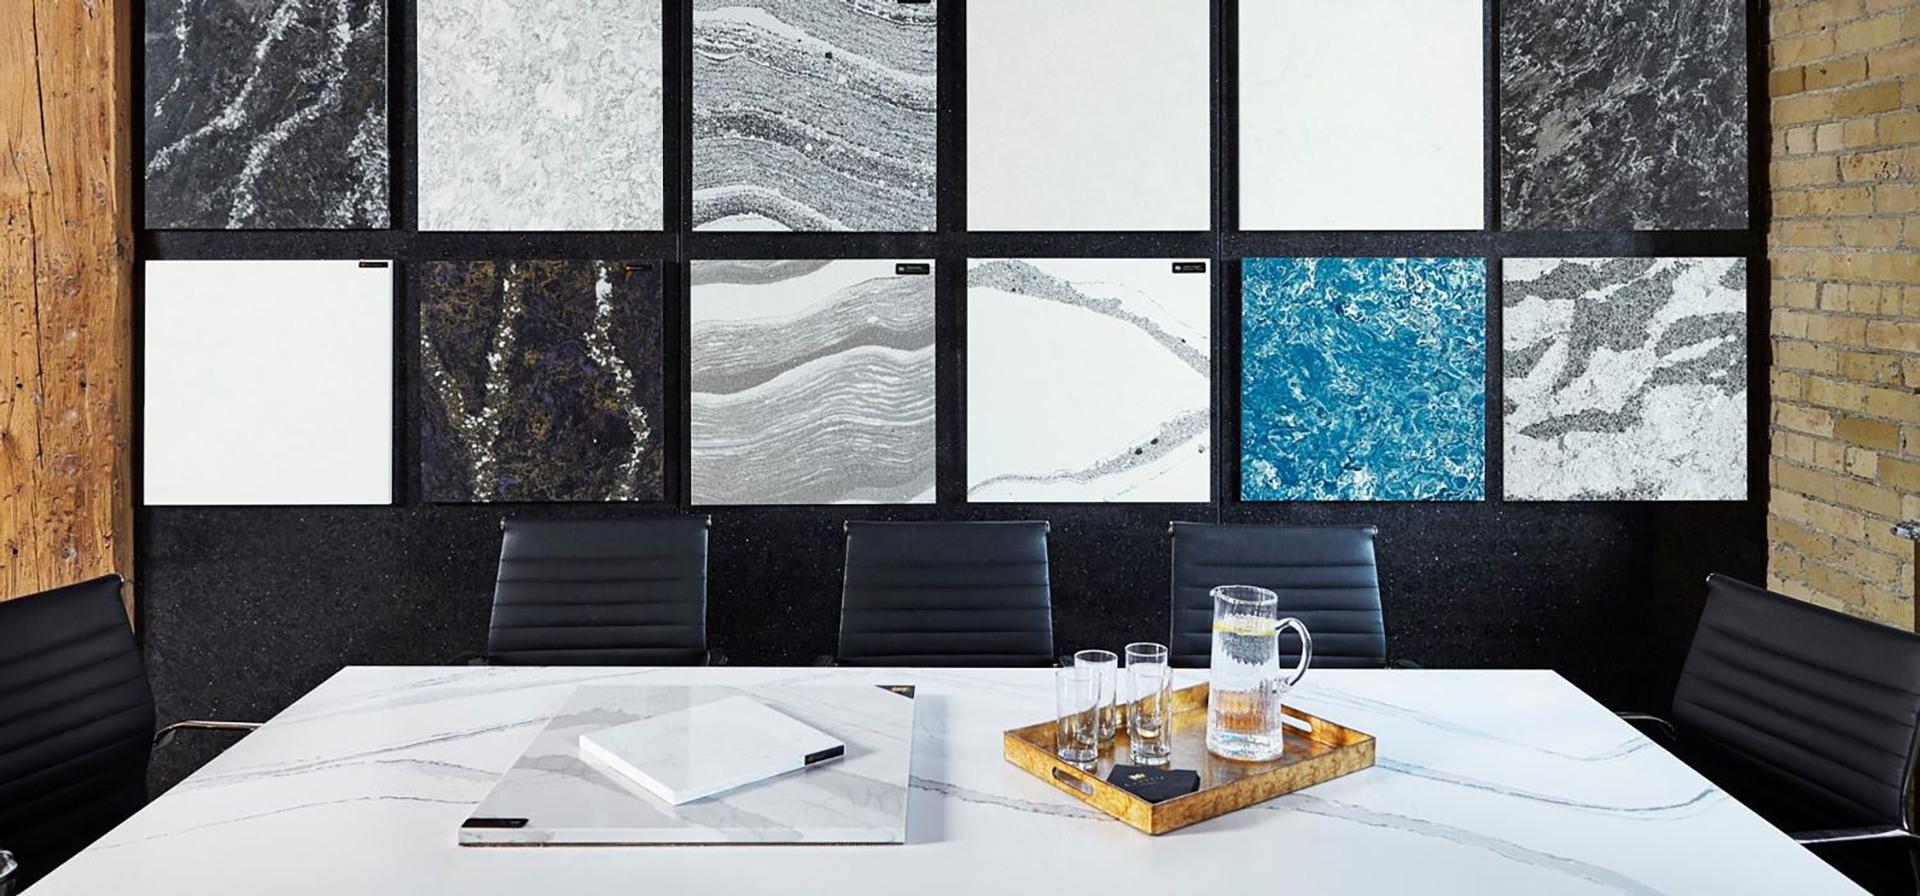 Cambria Gallery celebrates Christine Tatilon Designs – Quality, Esthetics, Sustainability